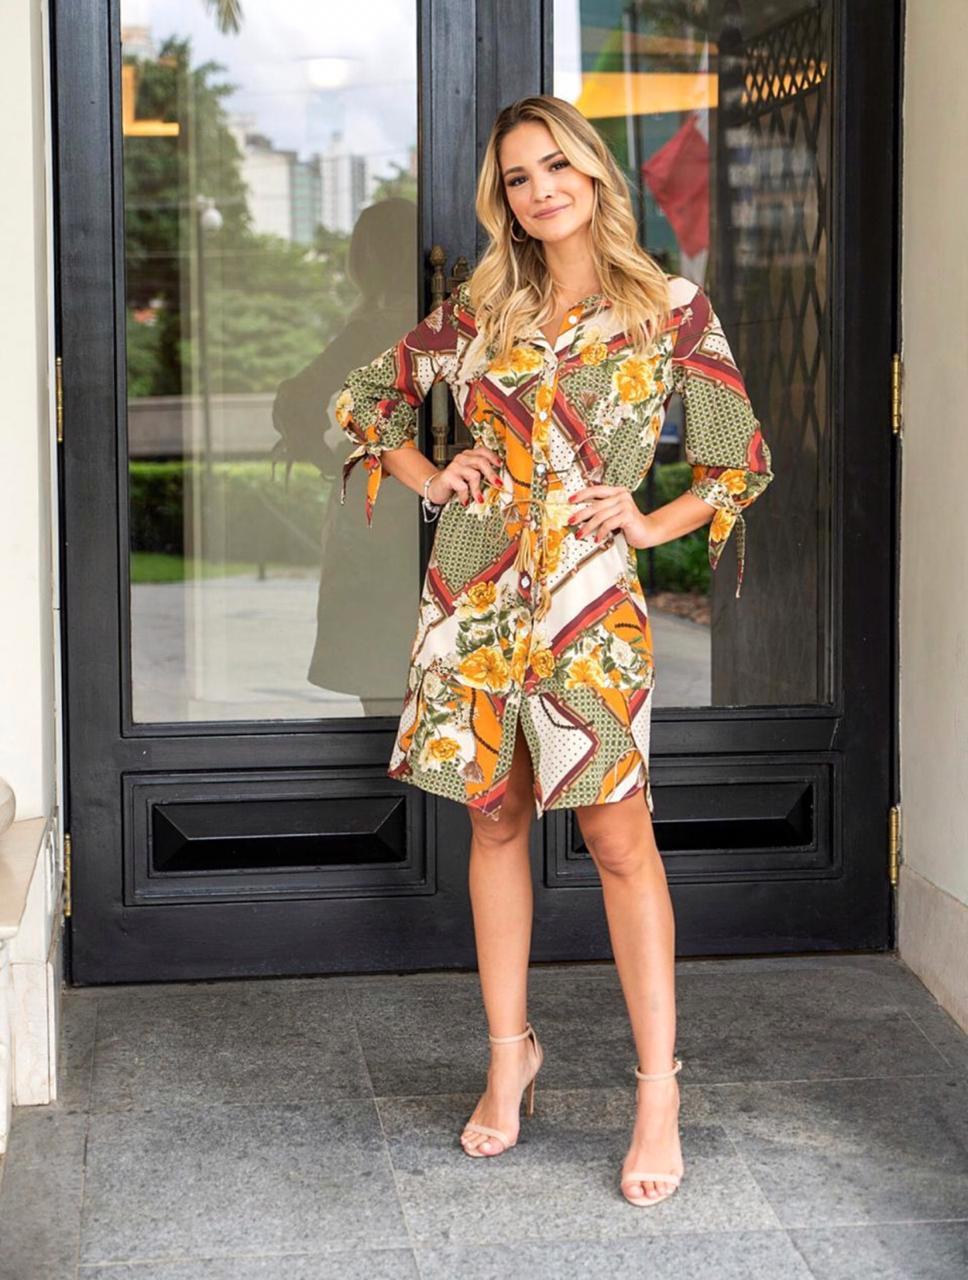 Vestido Nicole Chemise Crepe Detalhe Laço Manga + Cinto